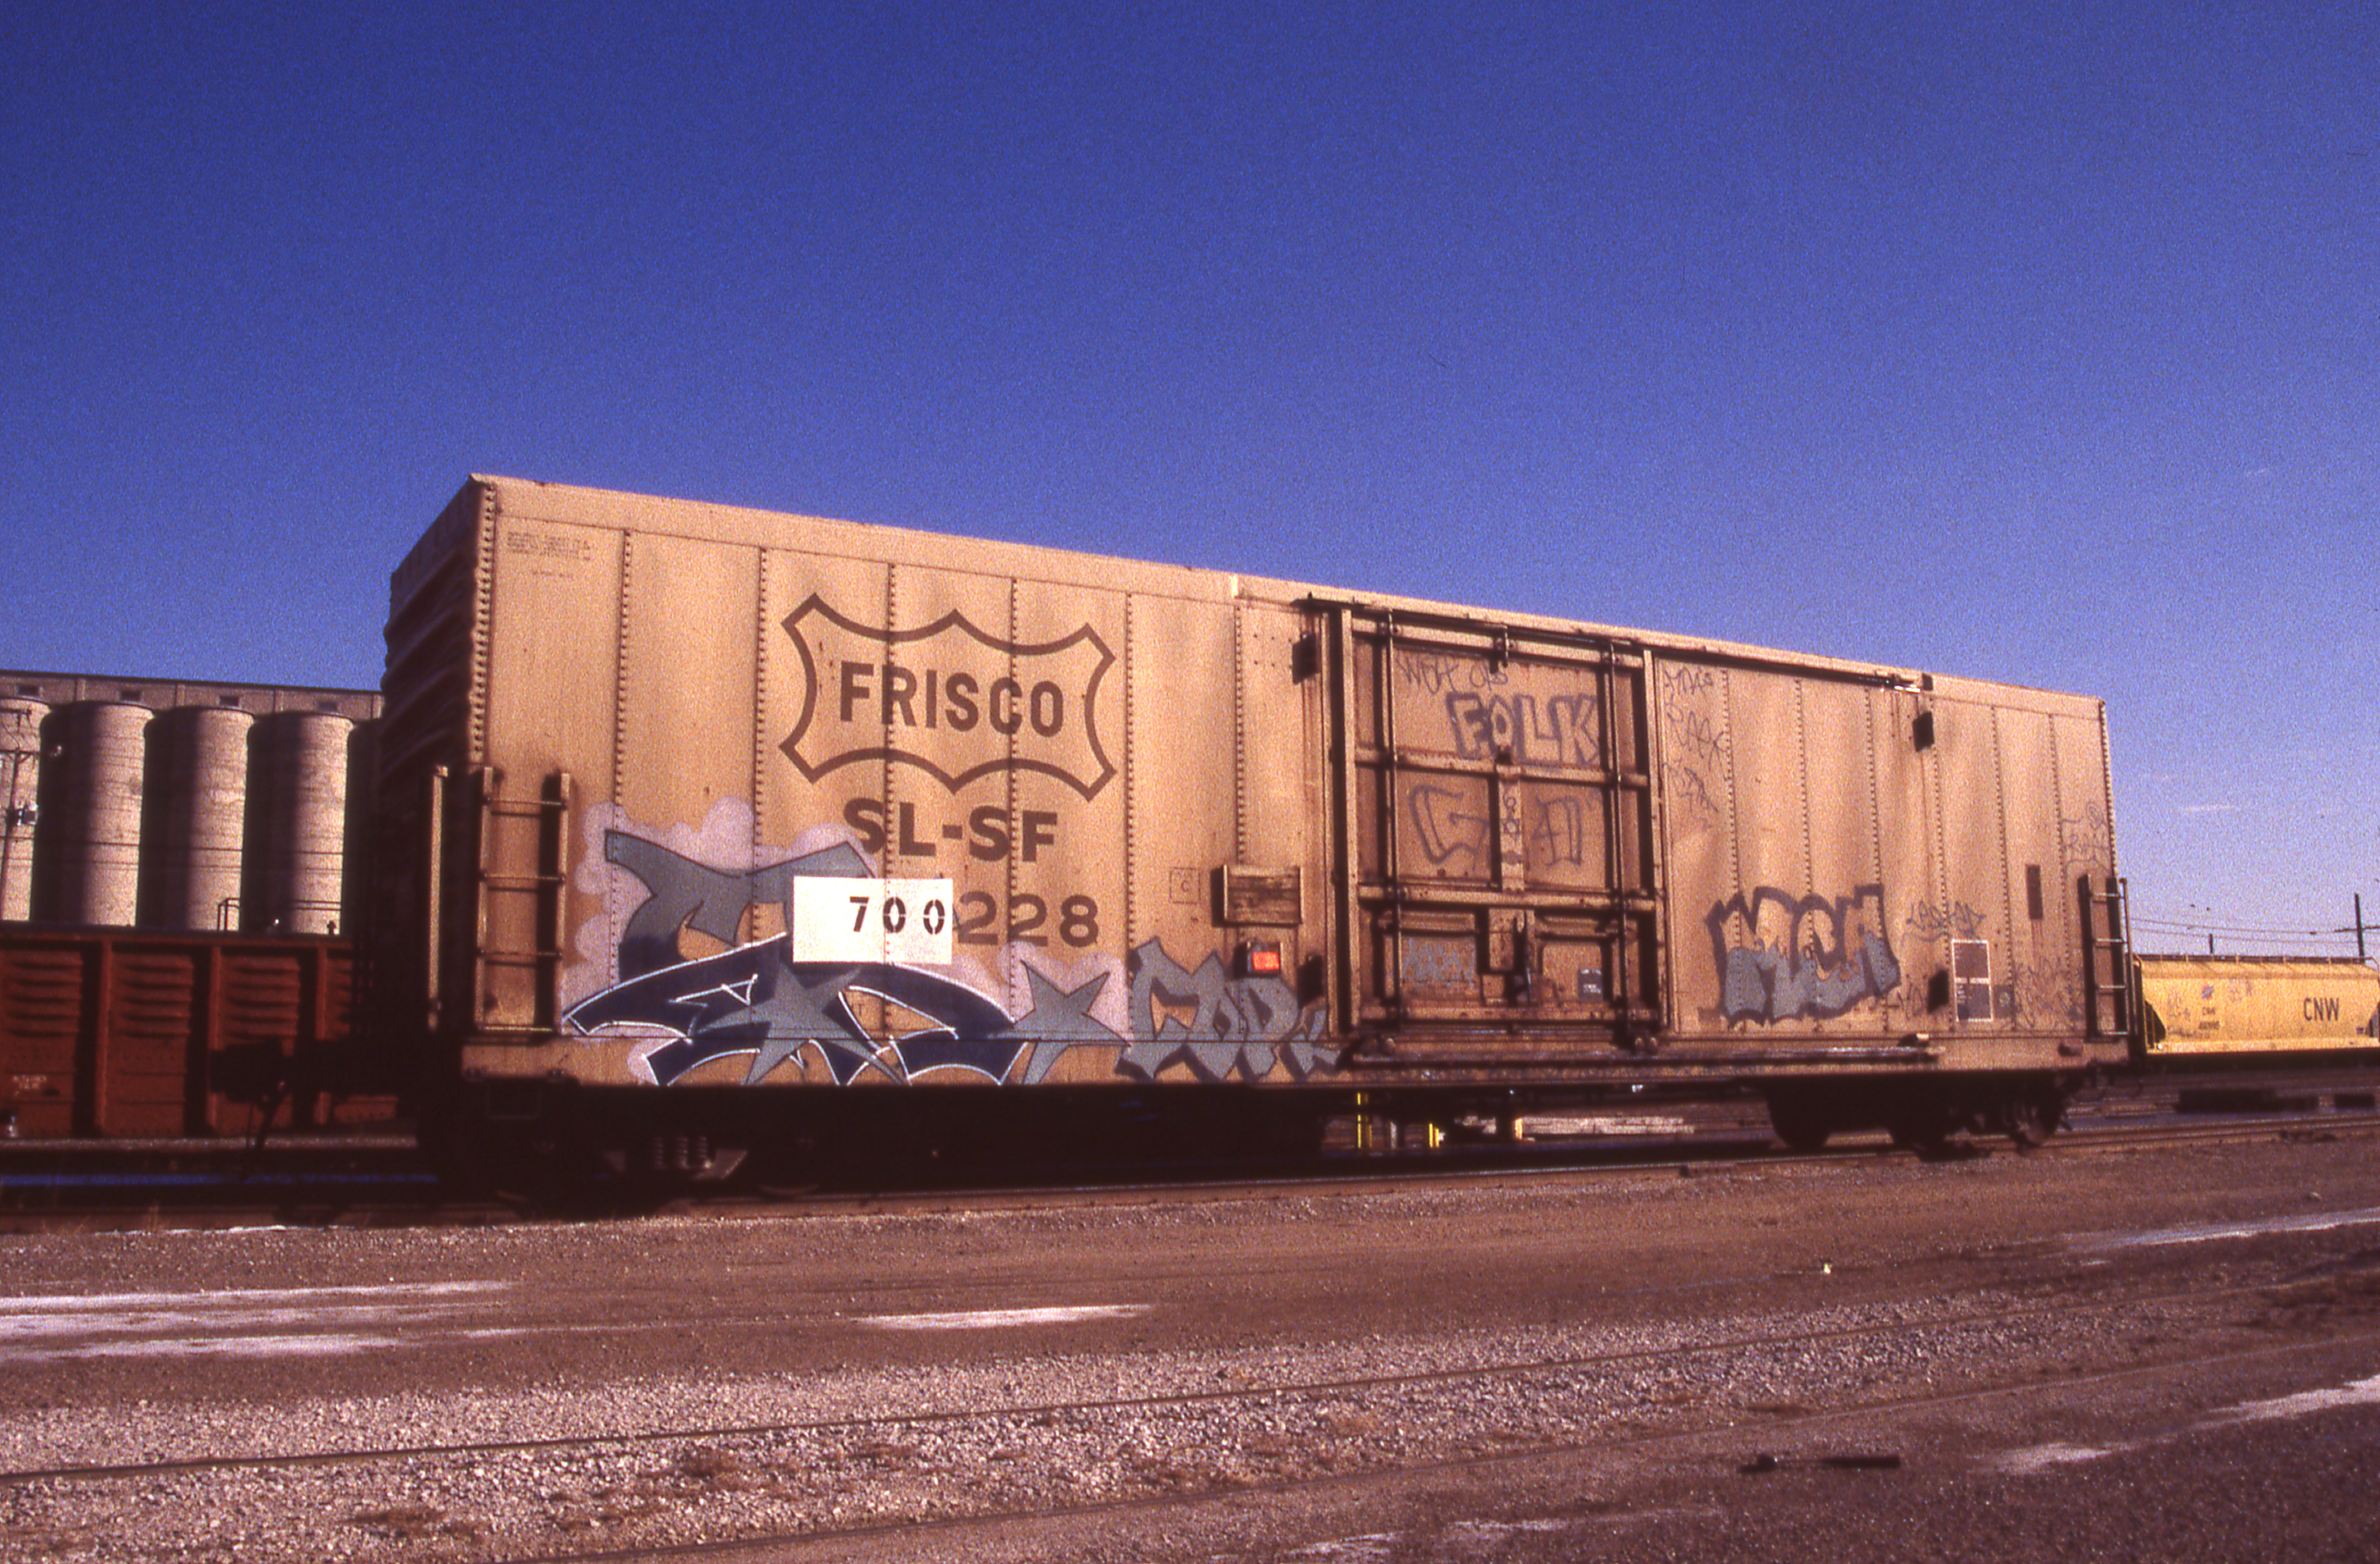 Boxcar 700228 at Kansas City, Missouri on January 17, 1998 (R.R. Taylor)